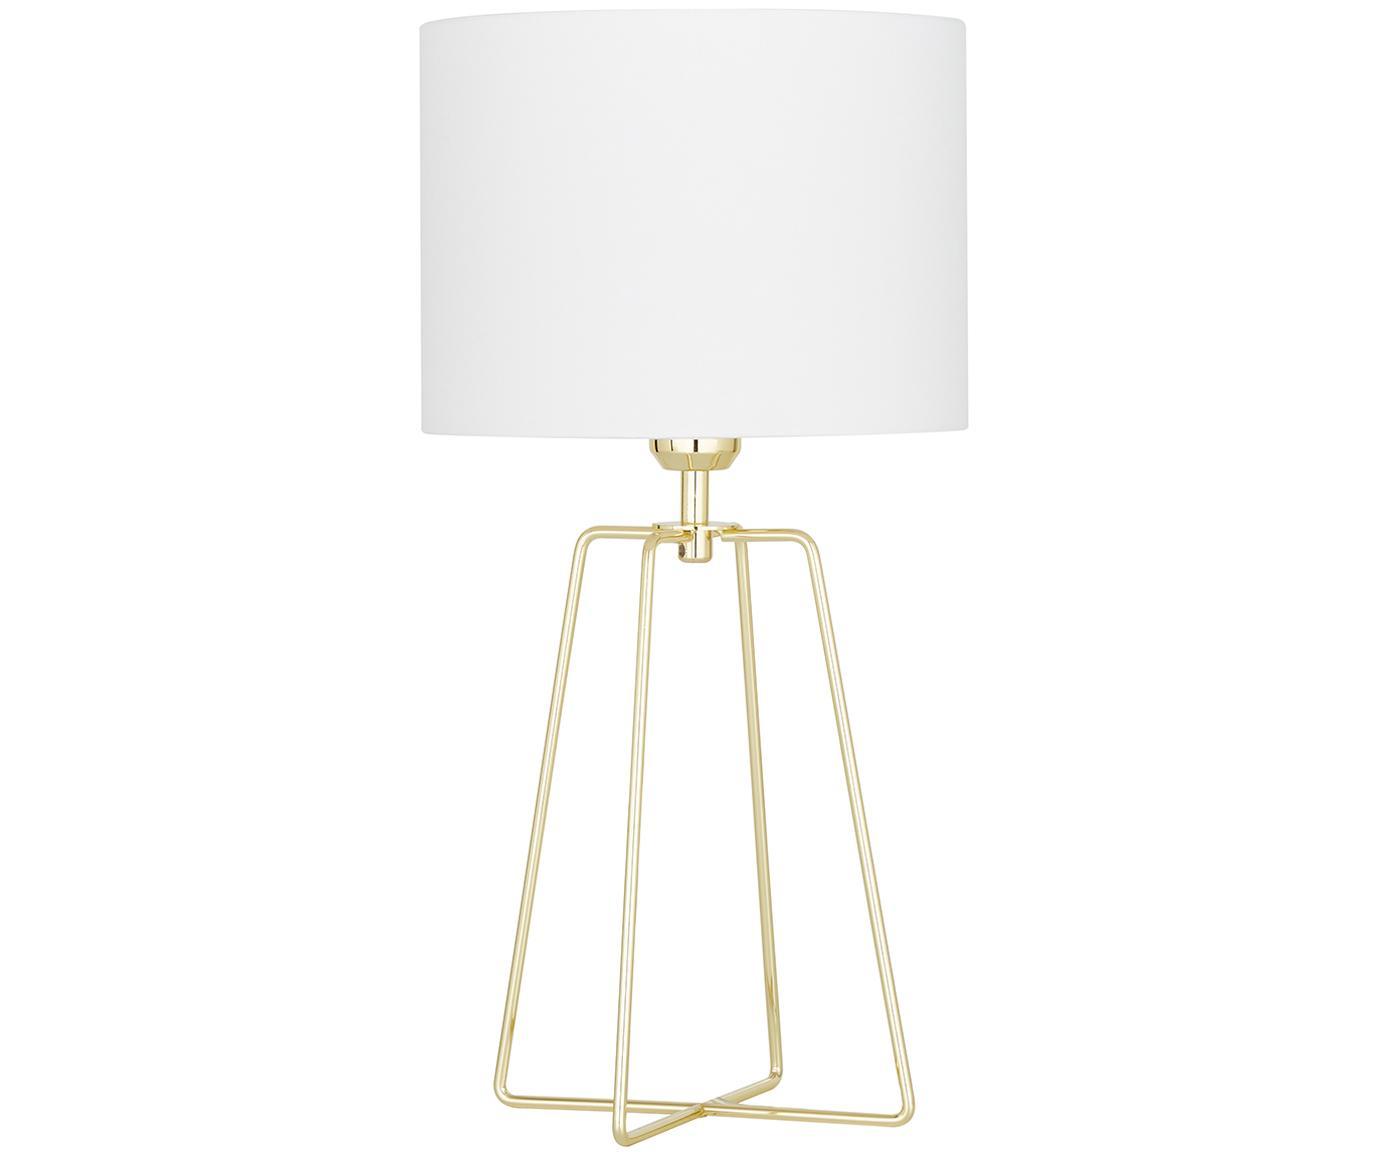 Tischleuchte Karolina, Lampenschirm: Textil, Lampenfuß: Metall, vermessingt, Weiß, Gold, Ø 25 x H 49 cm